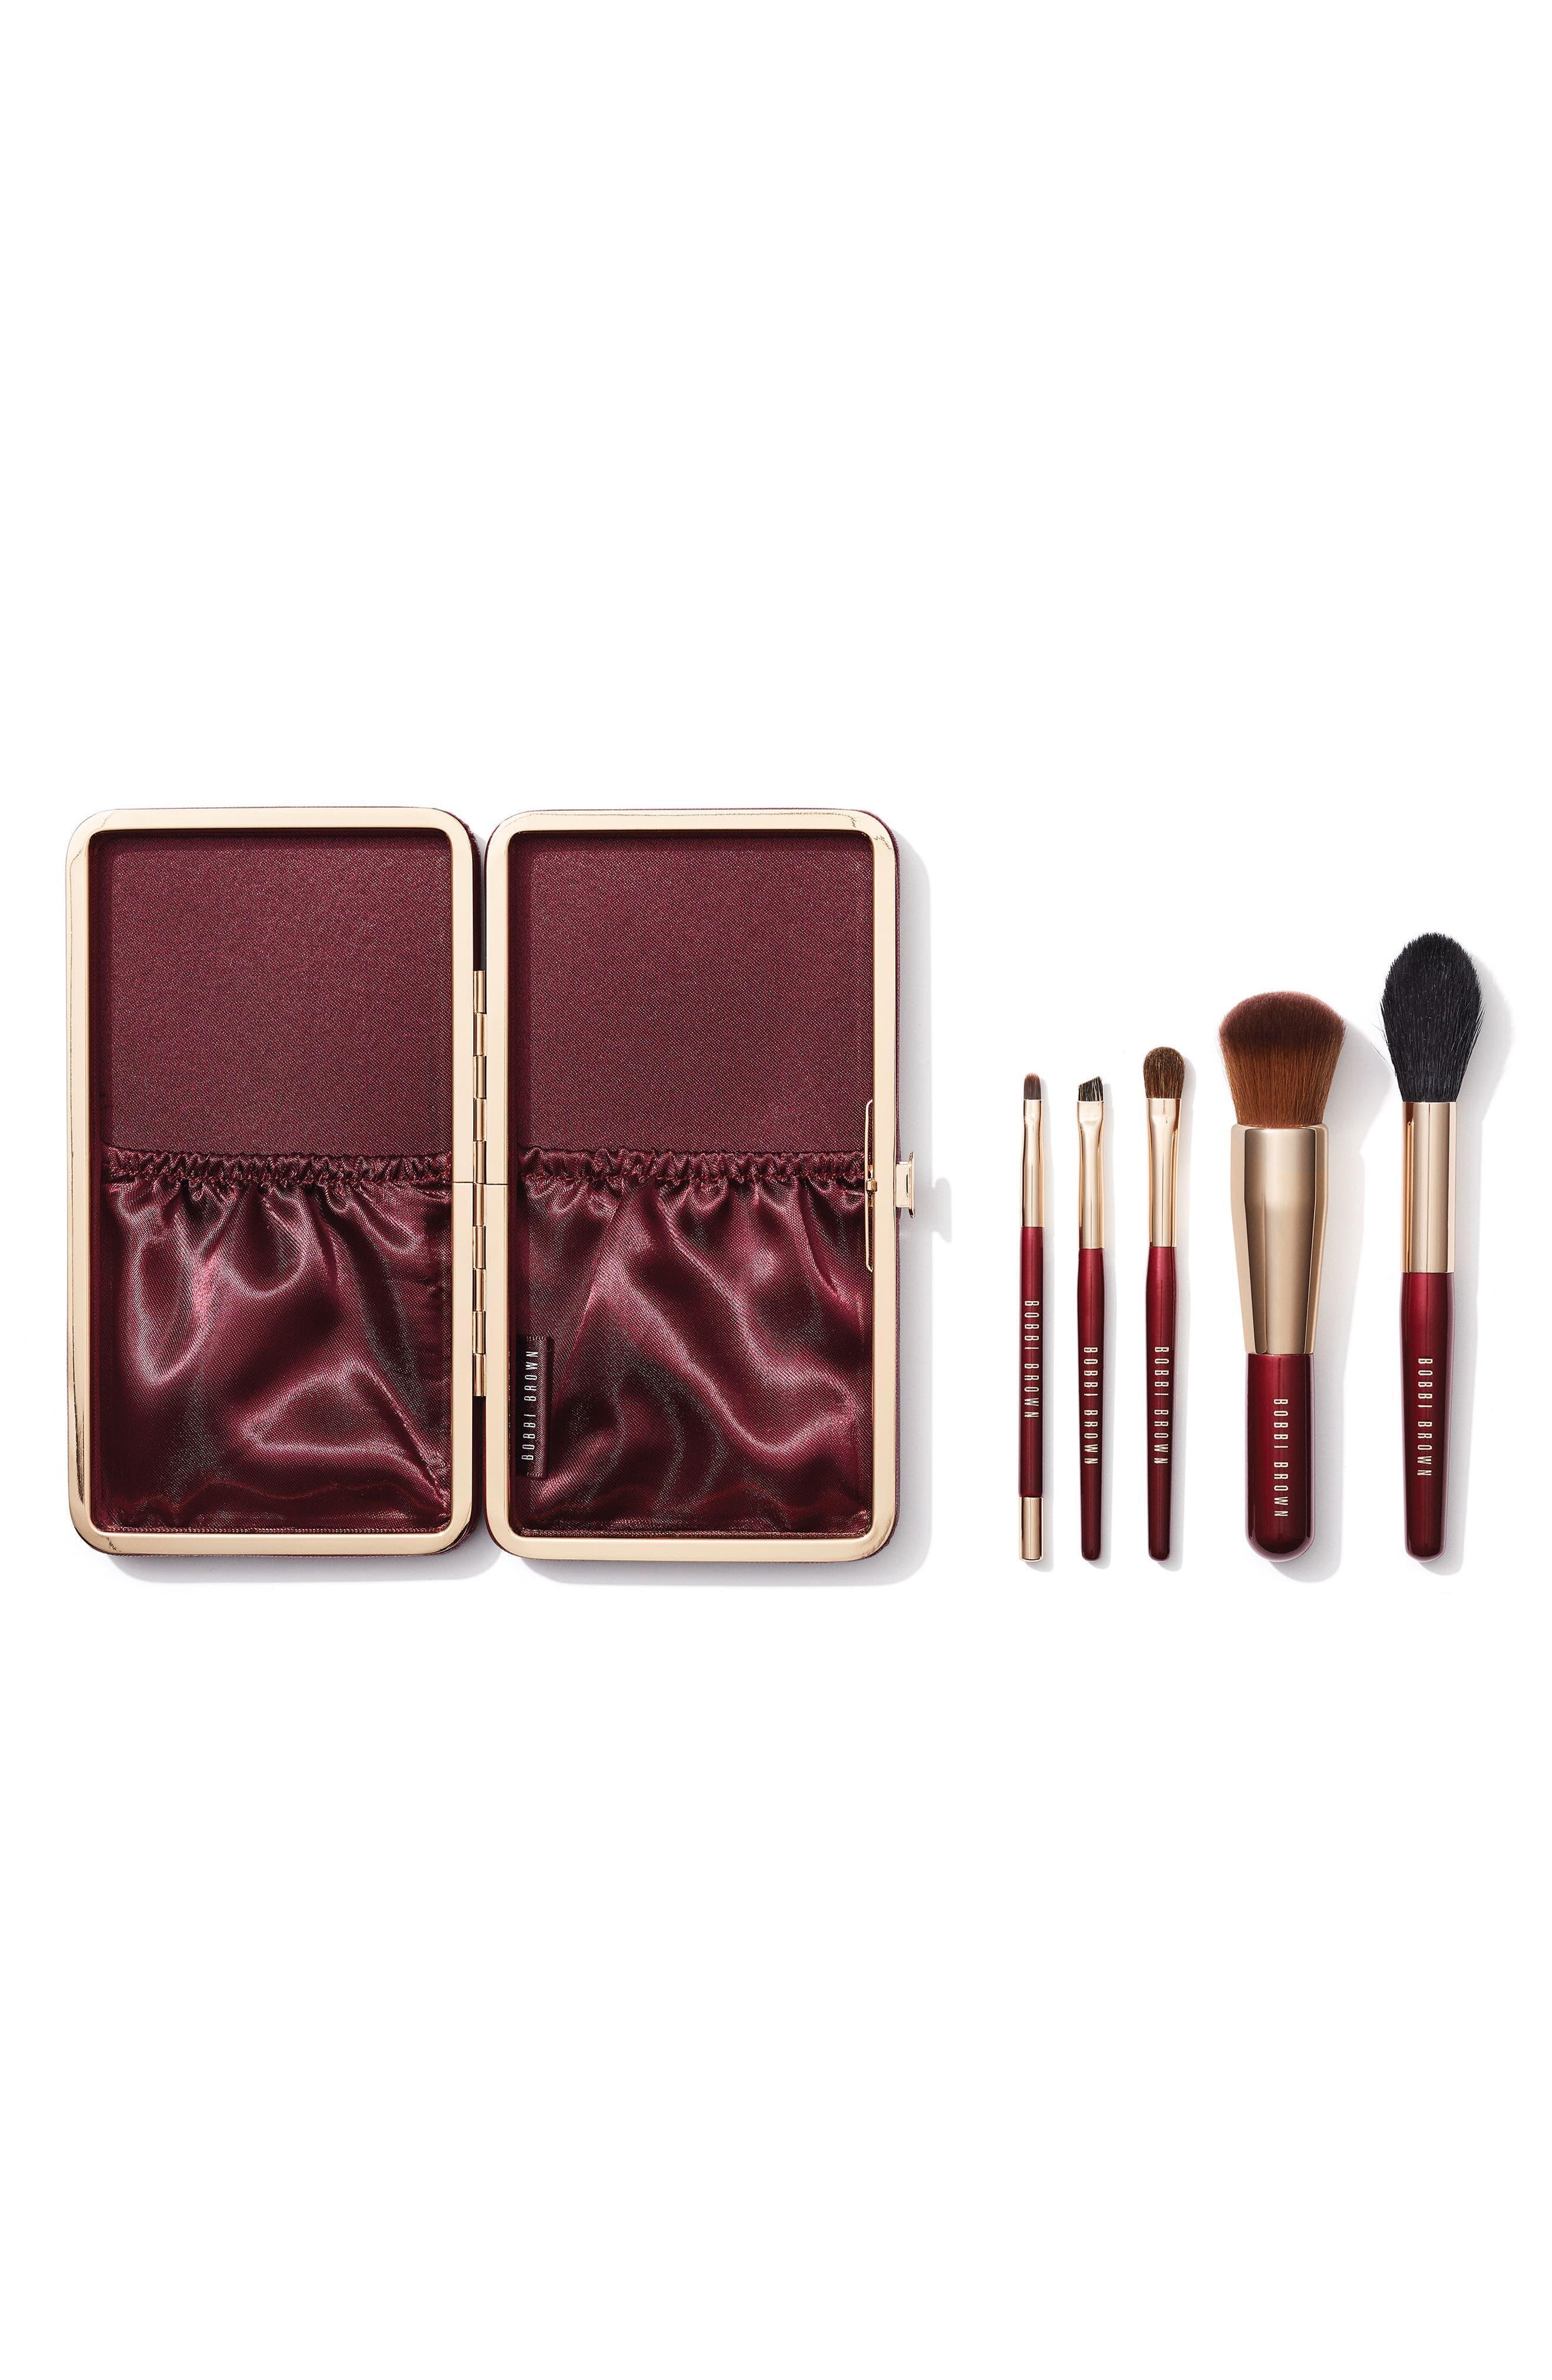 bobbi brown brushes uses. bobbi brown travel brush set ($228 value) brushes uses 2